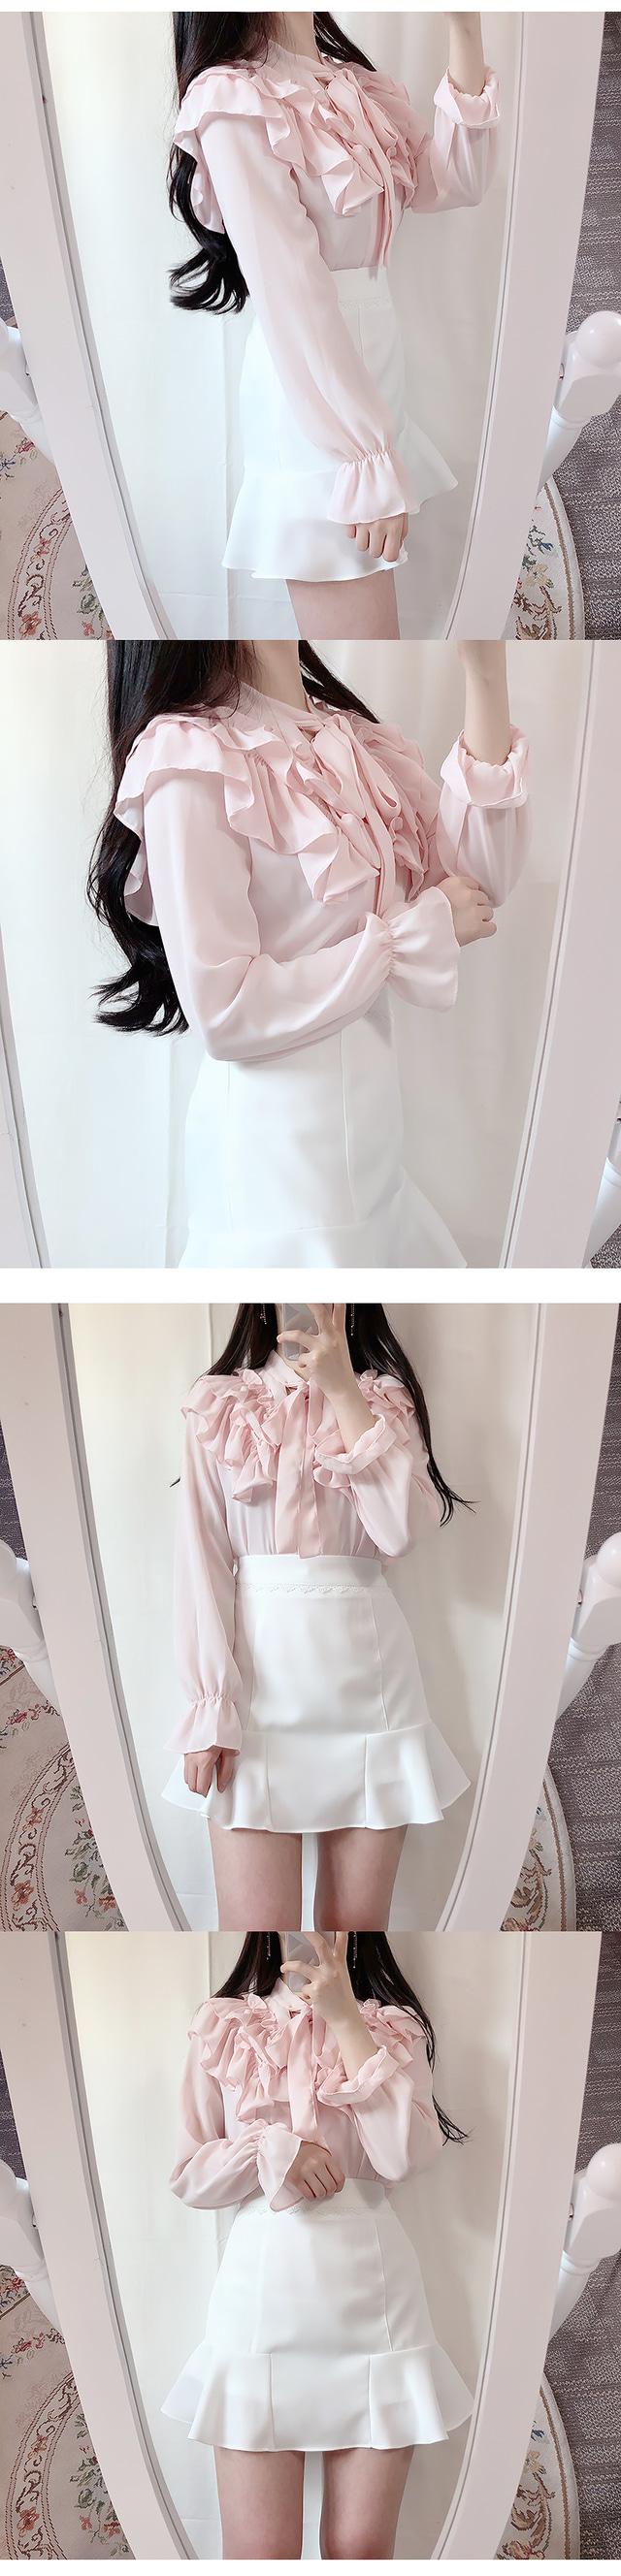 Geneve frilly ribbon blouse